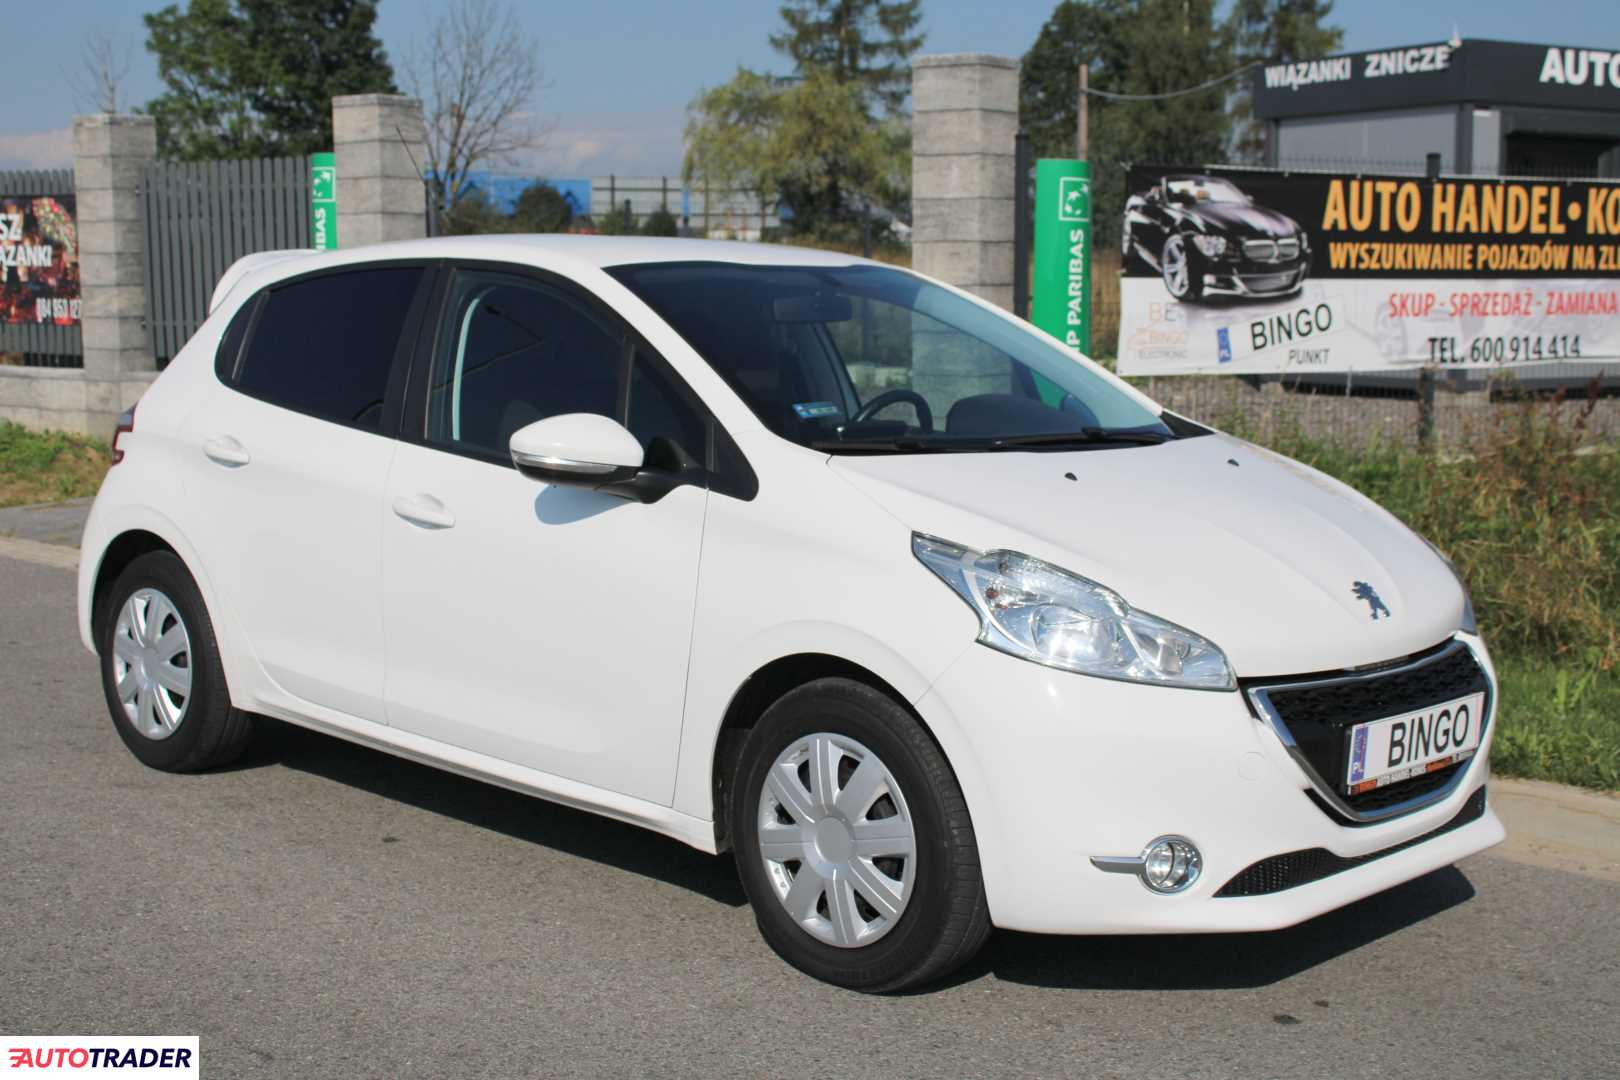 Peugeot 208 2013 1.2 82 KM